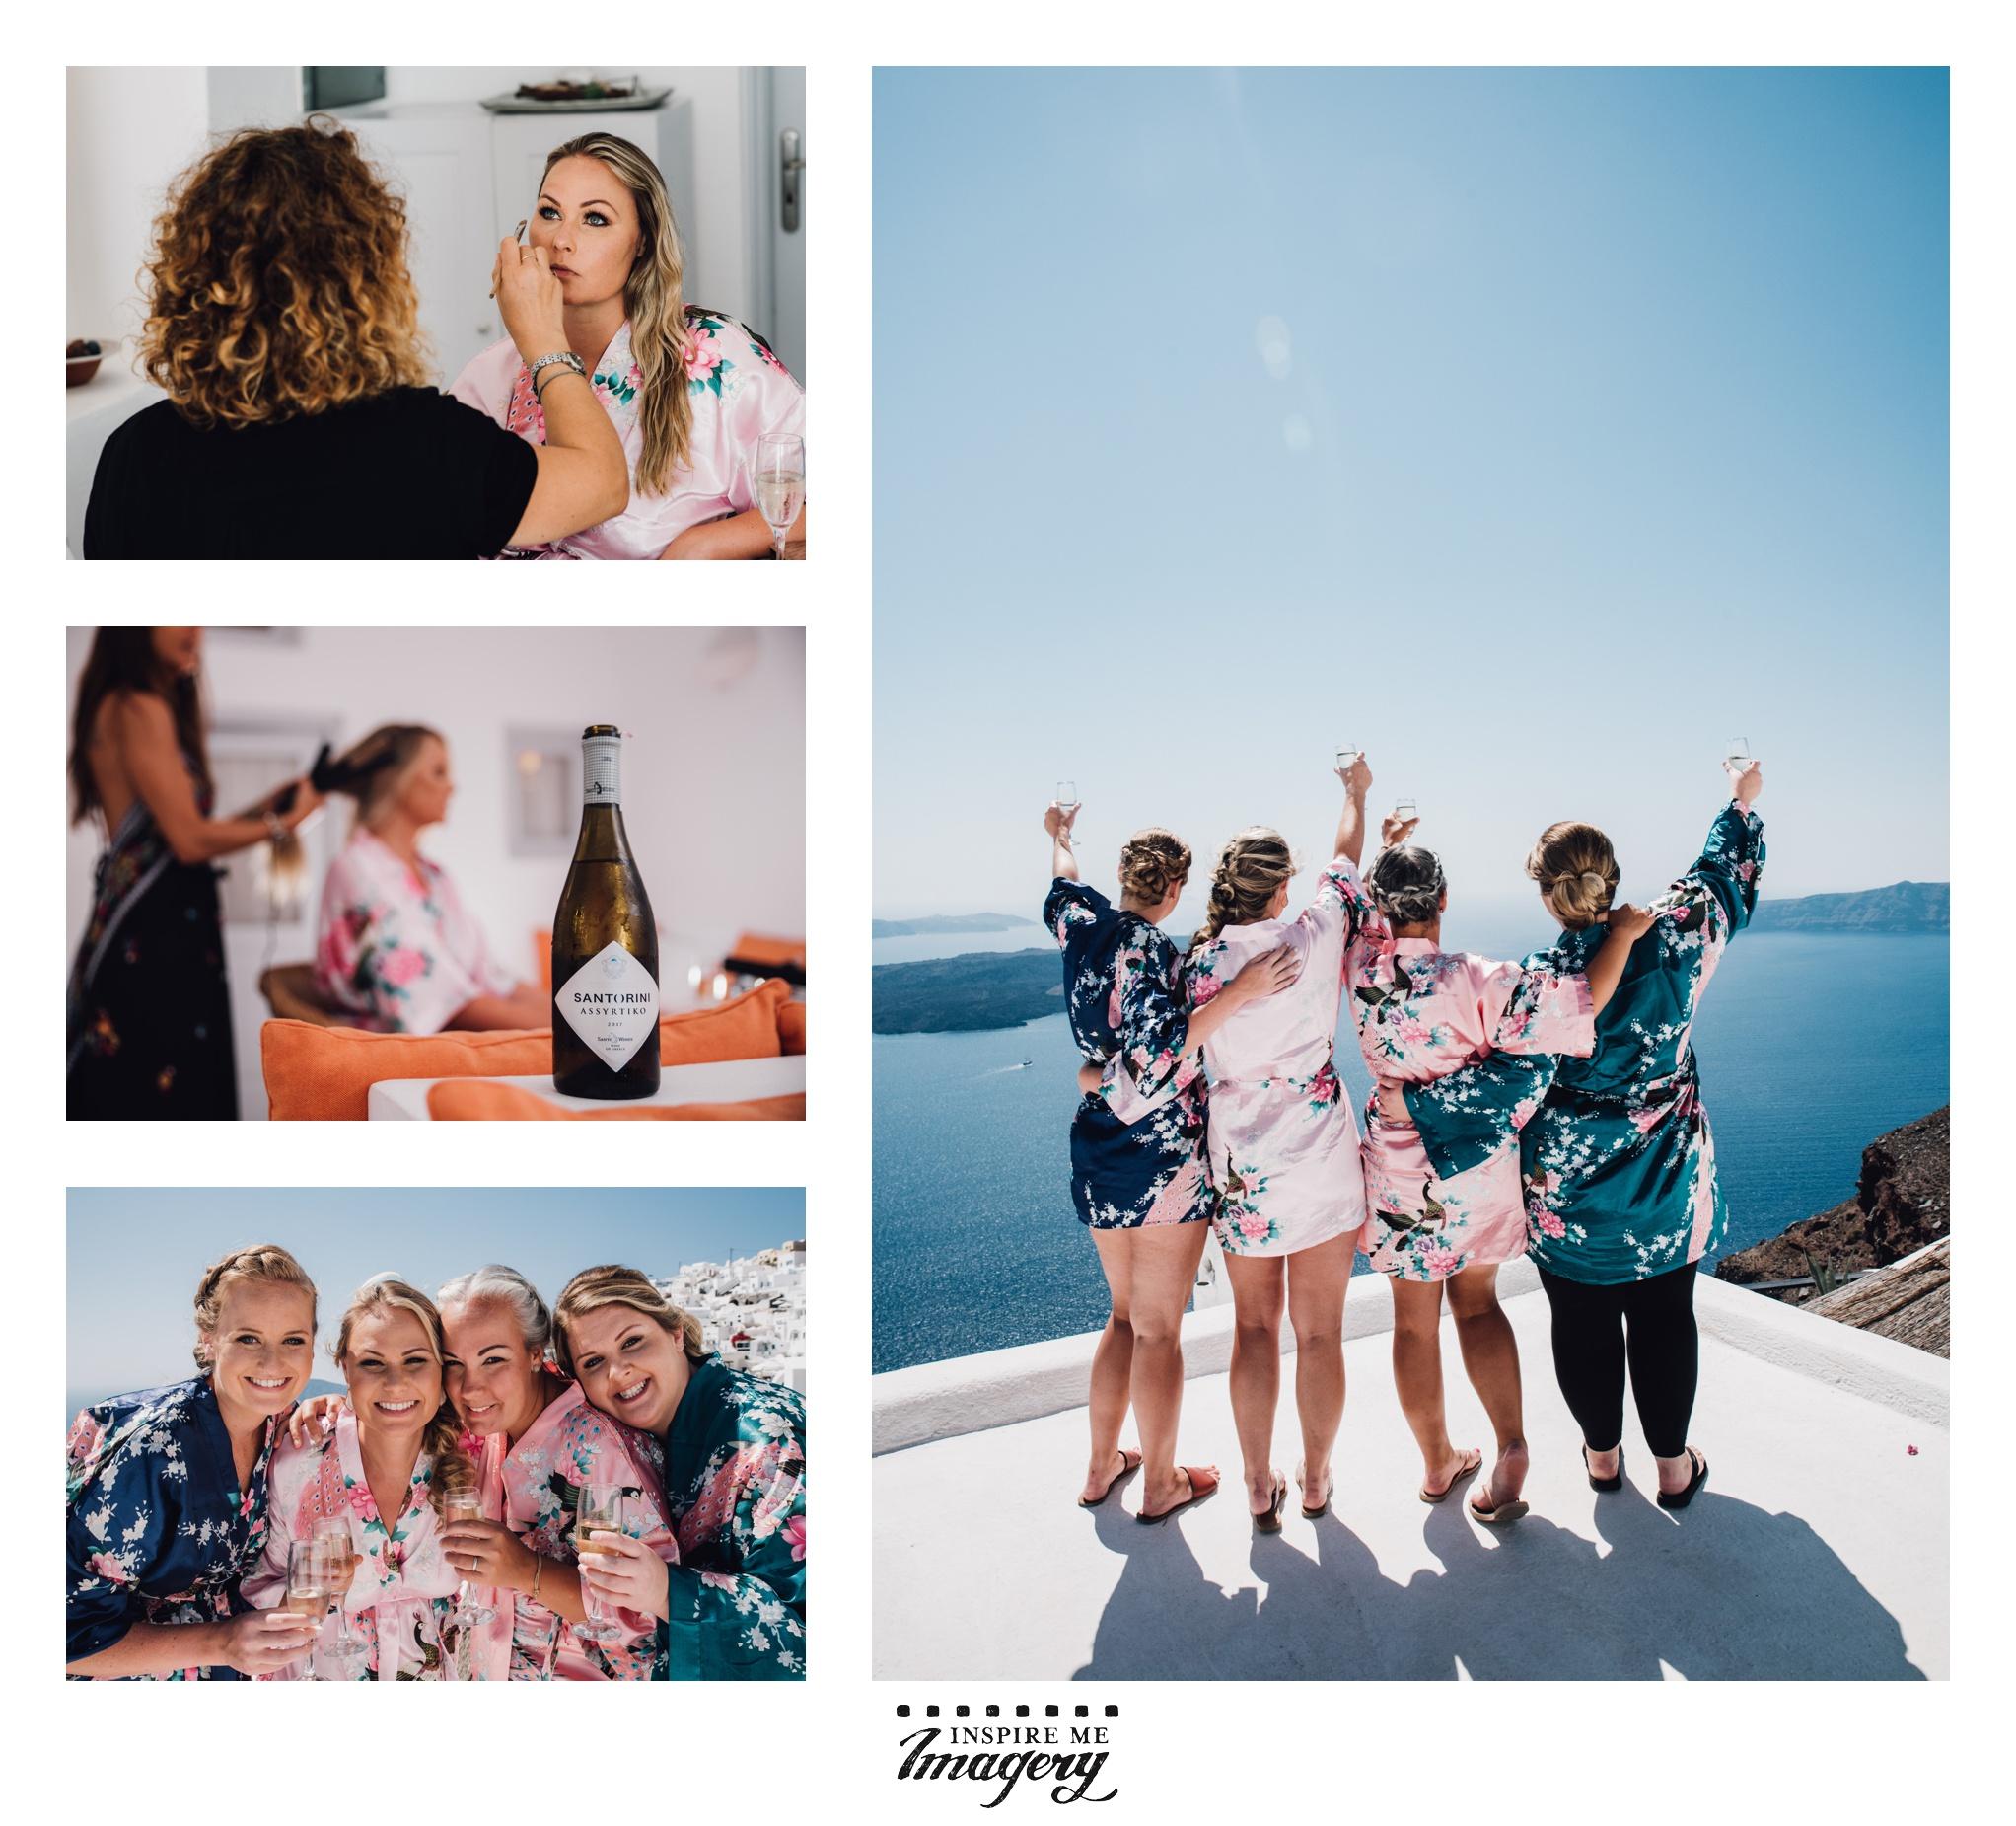 Greece-Santorini-Destination-Wedding-Photography9.jpg